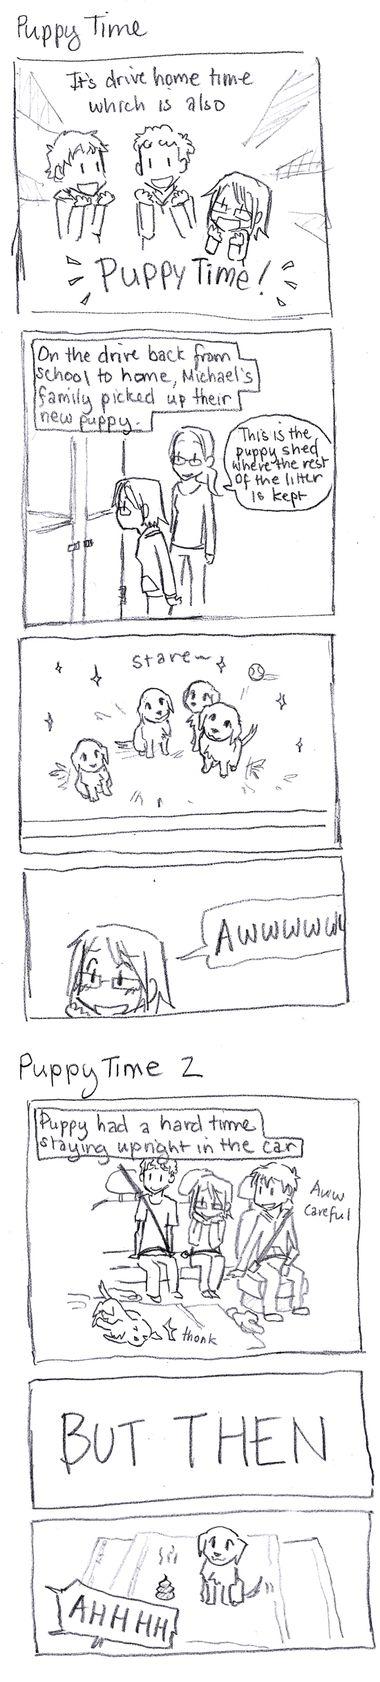 Winter Break Comics: Puppy Time